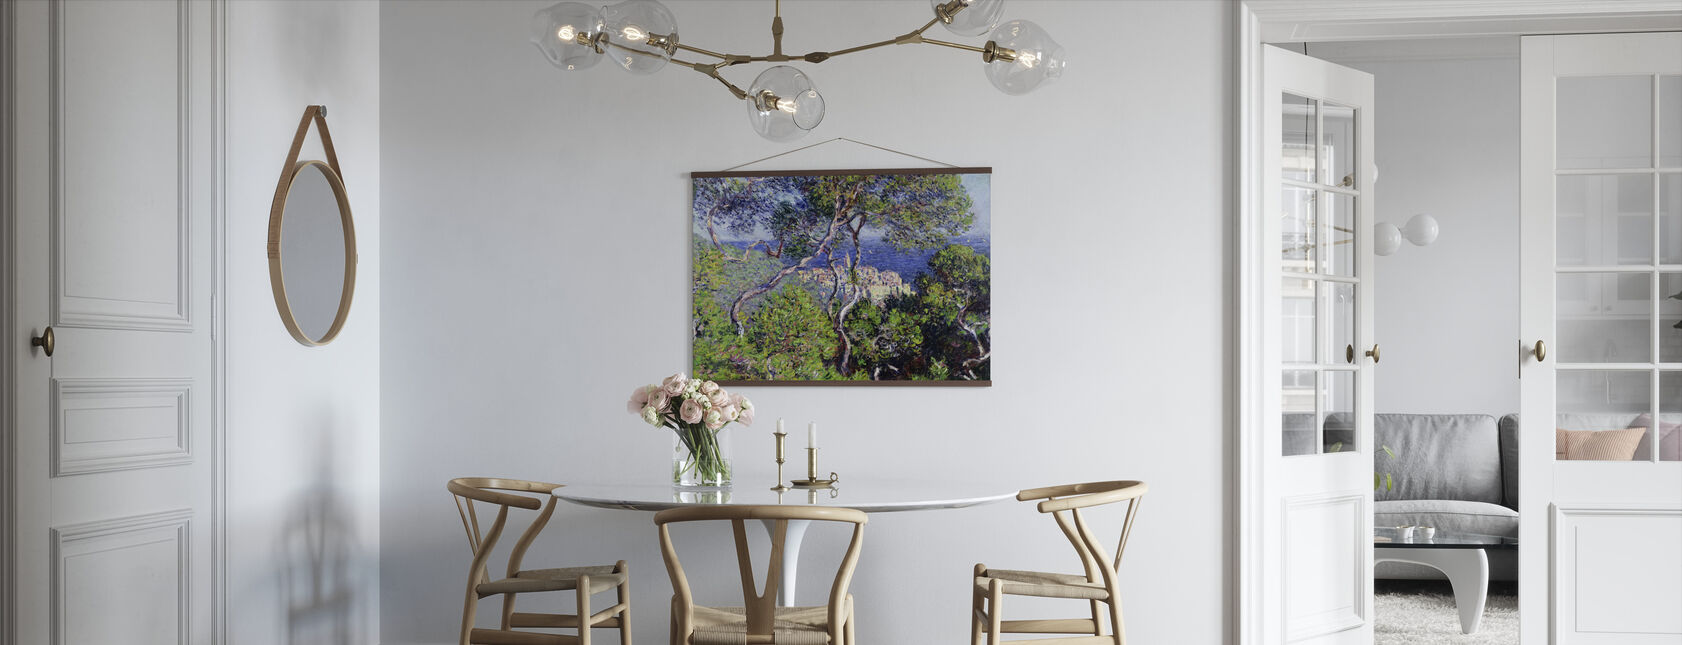 Bordighera -  Claude Monet - Poster - Kitchen